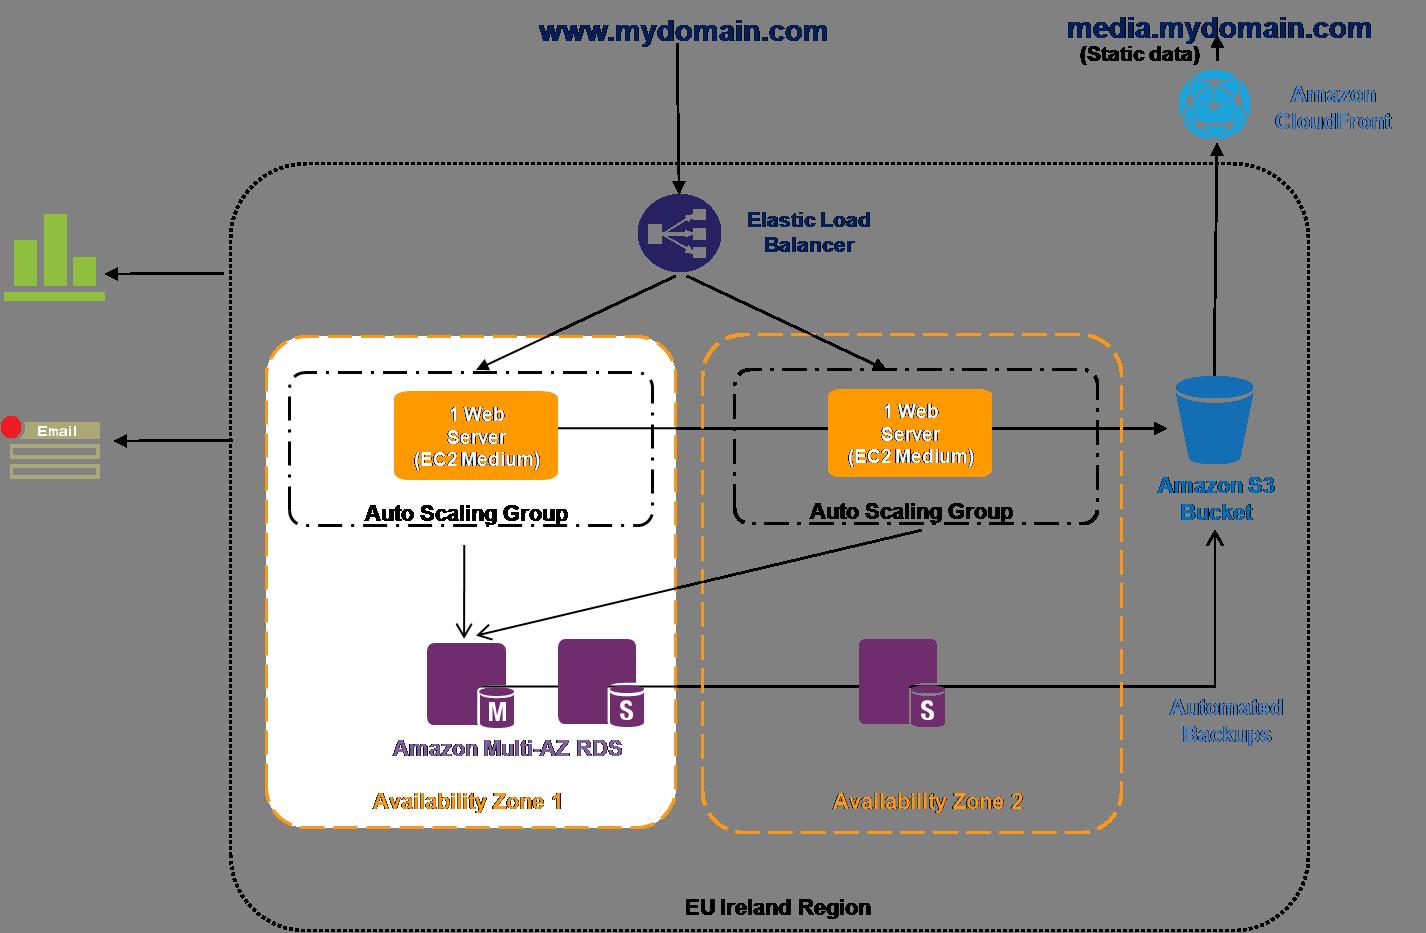 Installing Prestashop in Amazon Web Services (AWS) with Auto-scale